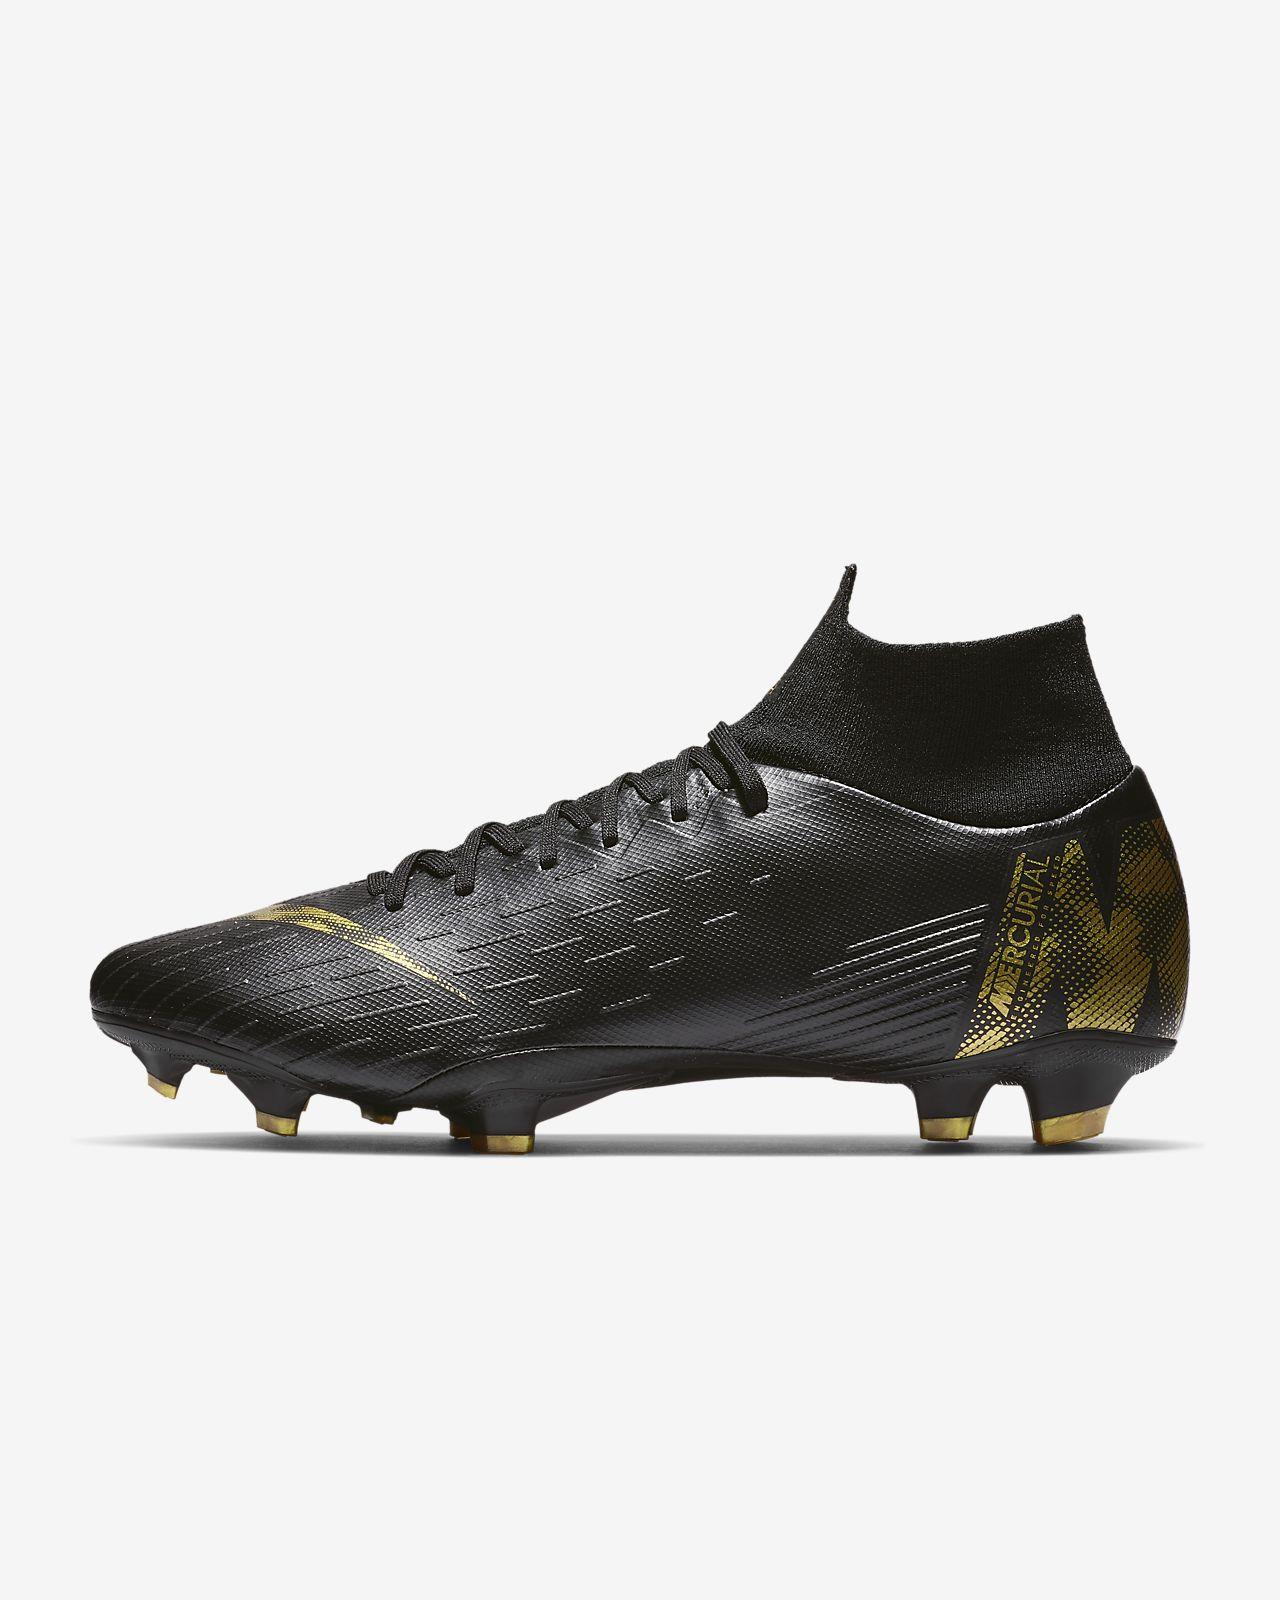 Nike Superfly 6 Pro FG Voetbalschoen (stevige ondergrond)